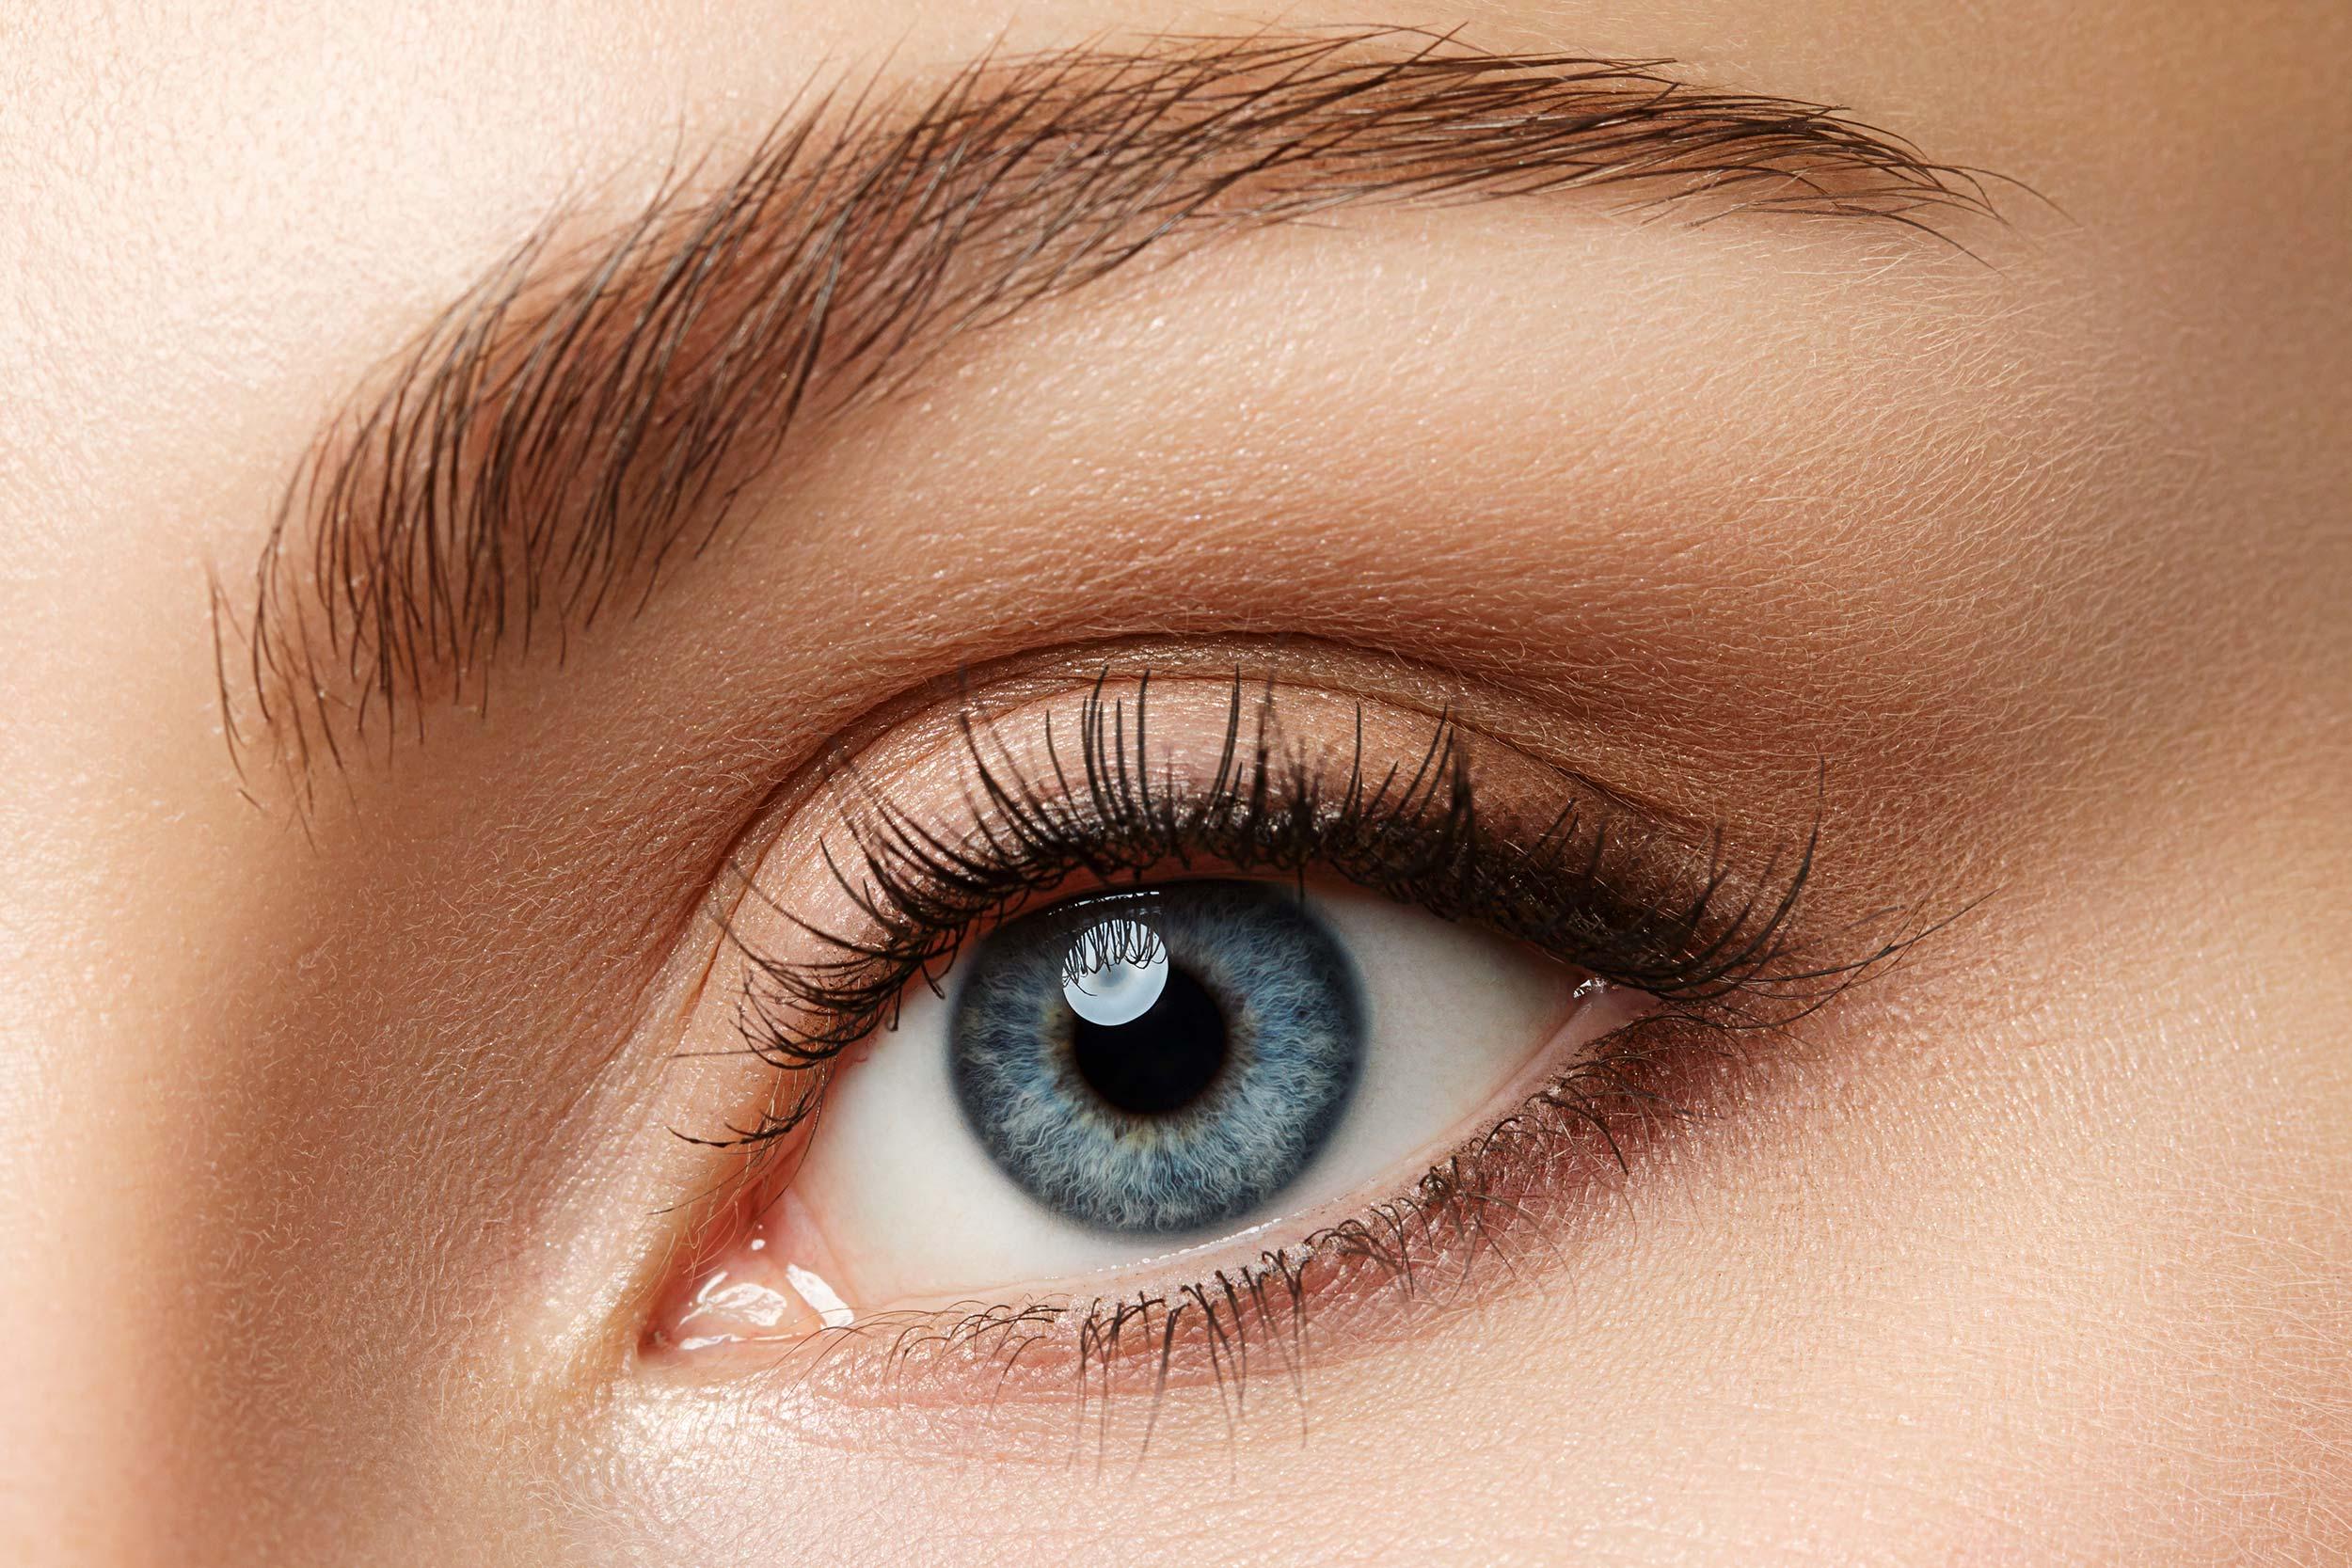 "<a href=""/blepharoplasty"">Eyelid Lift</a>"